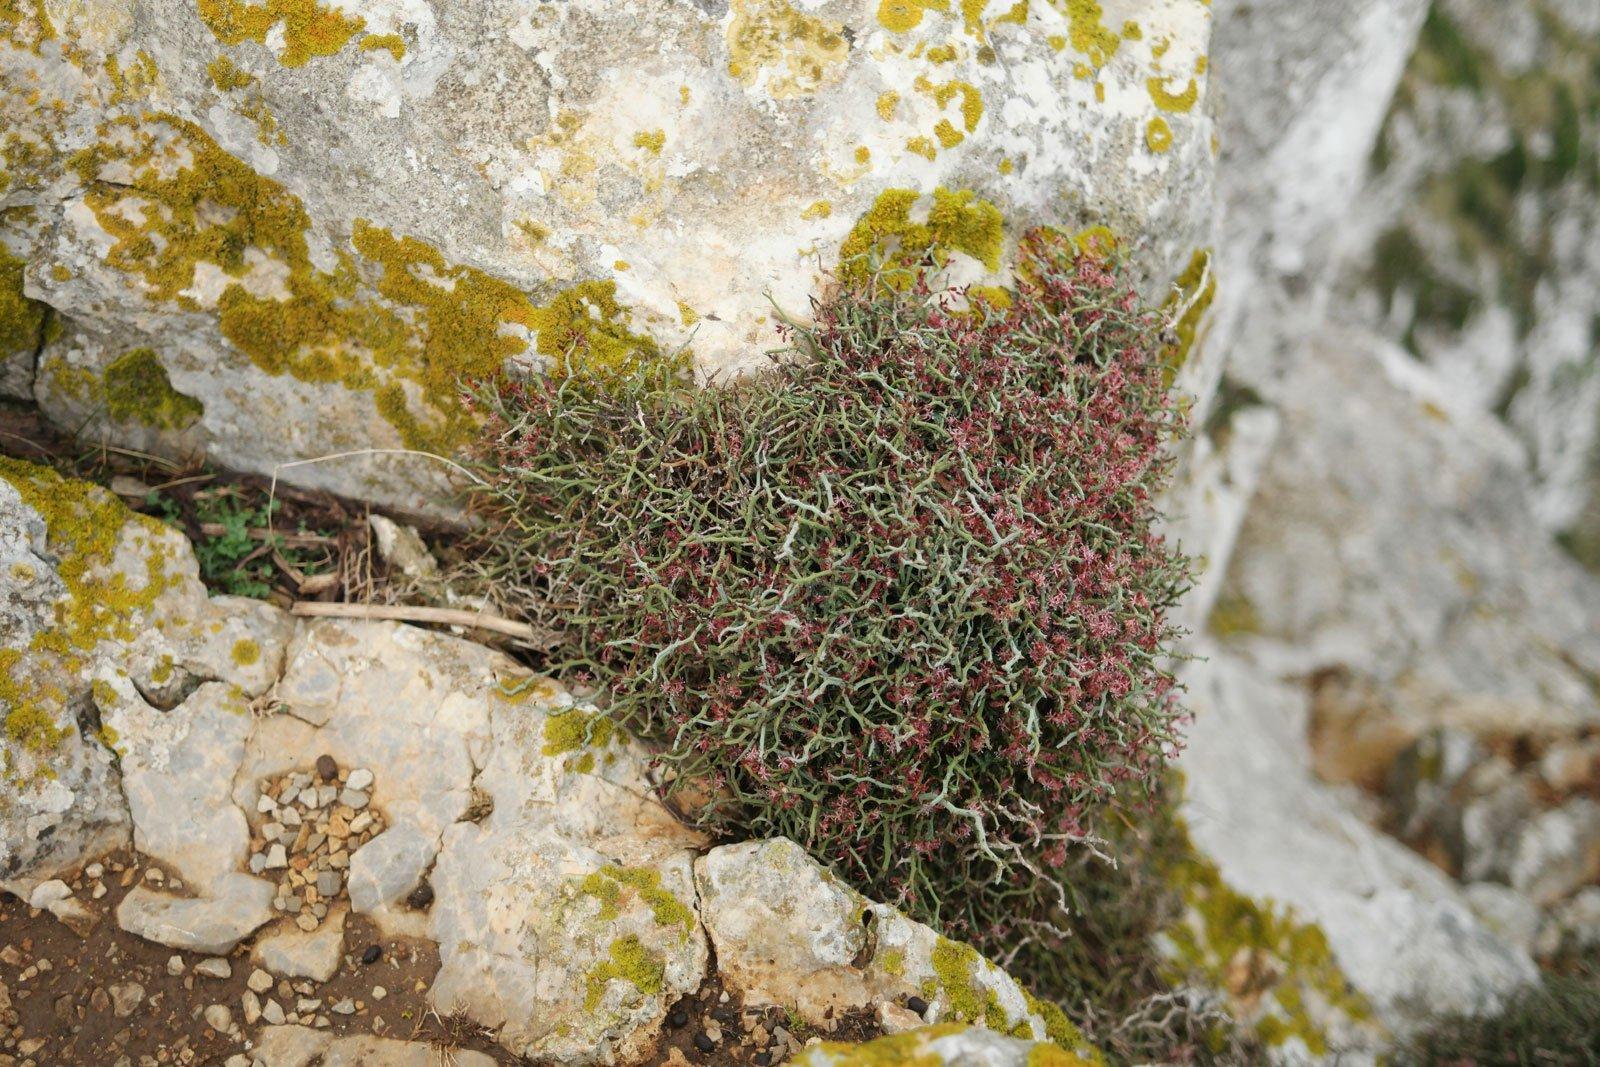 Smilax aspera ssp. balearica